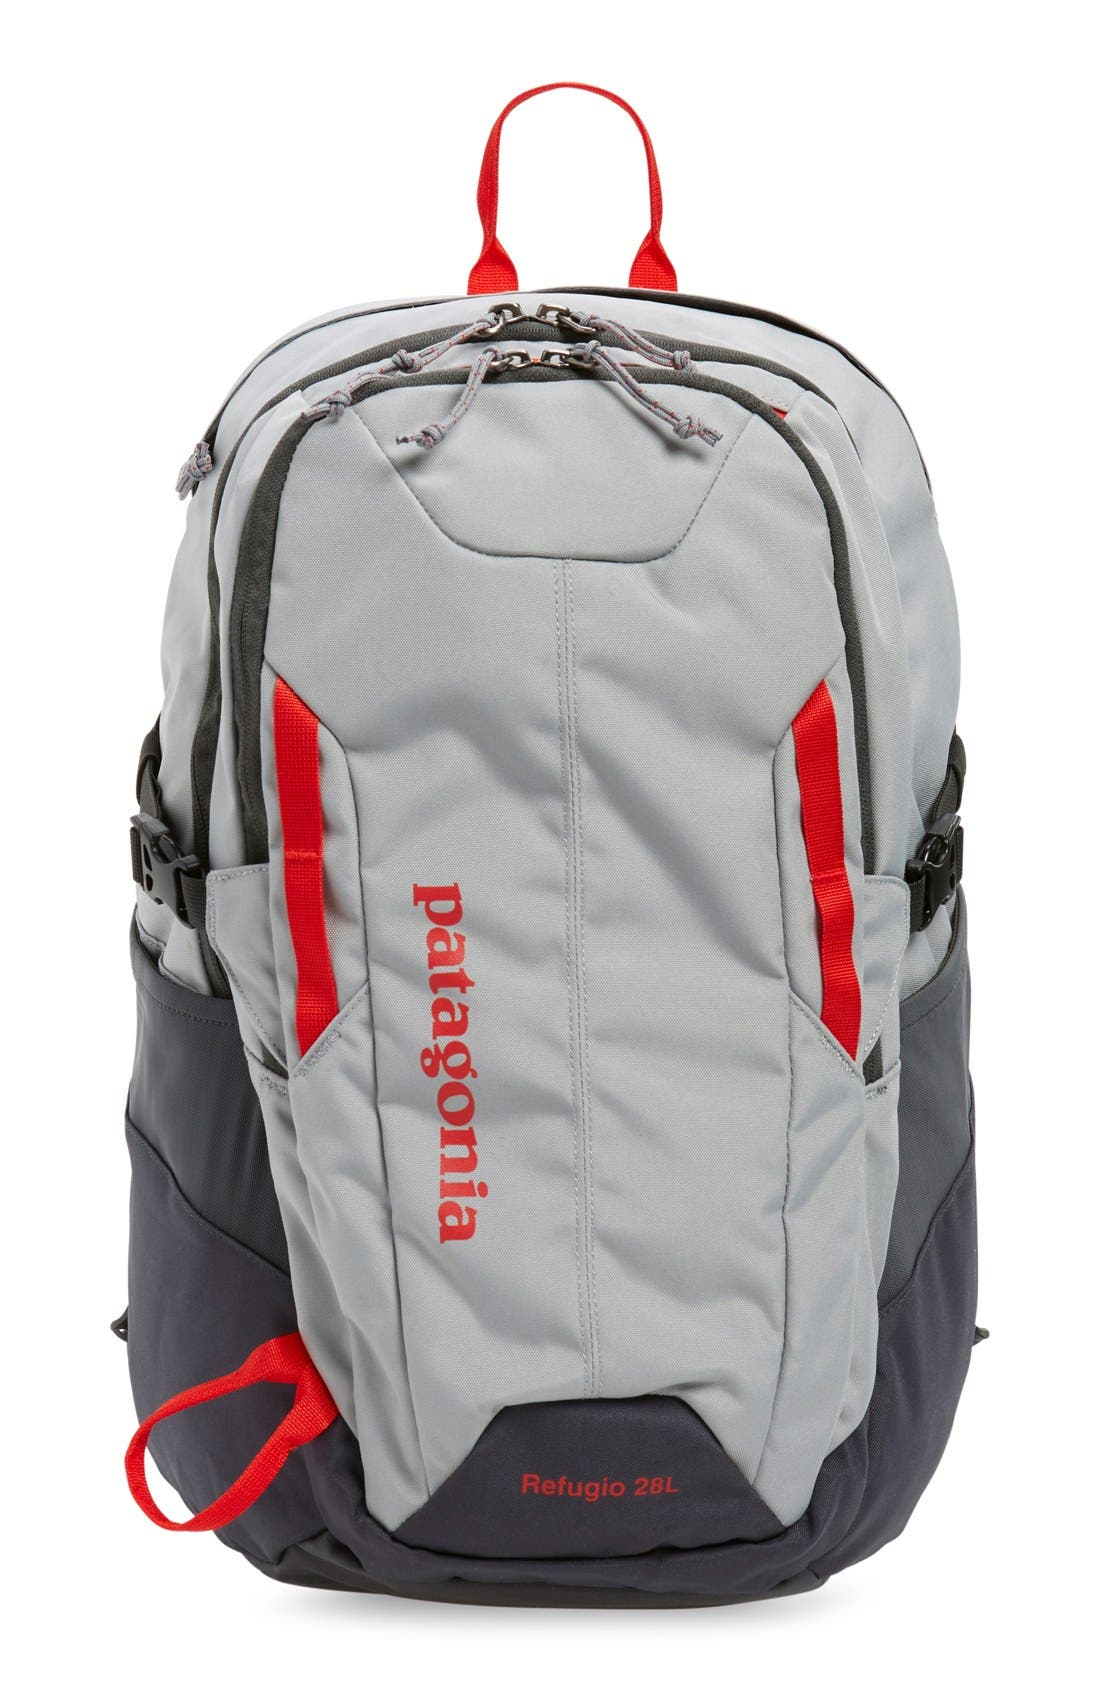 Alternate Image 1 Selected - Patagonia 'Refugio 28L' Backpack